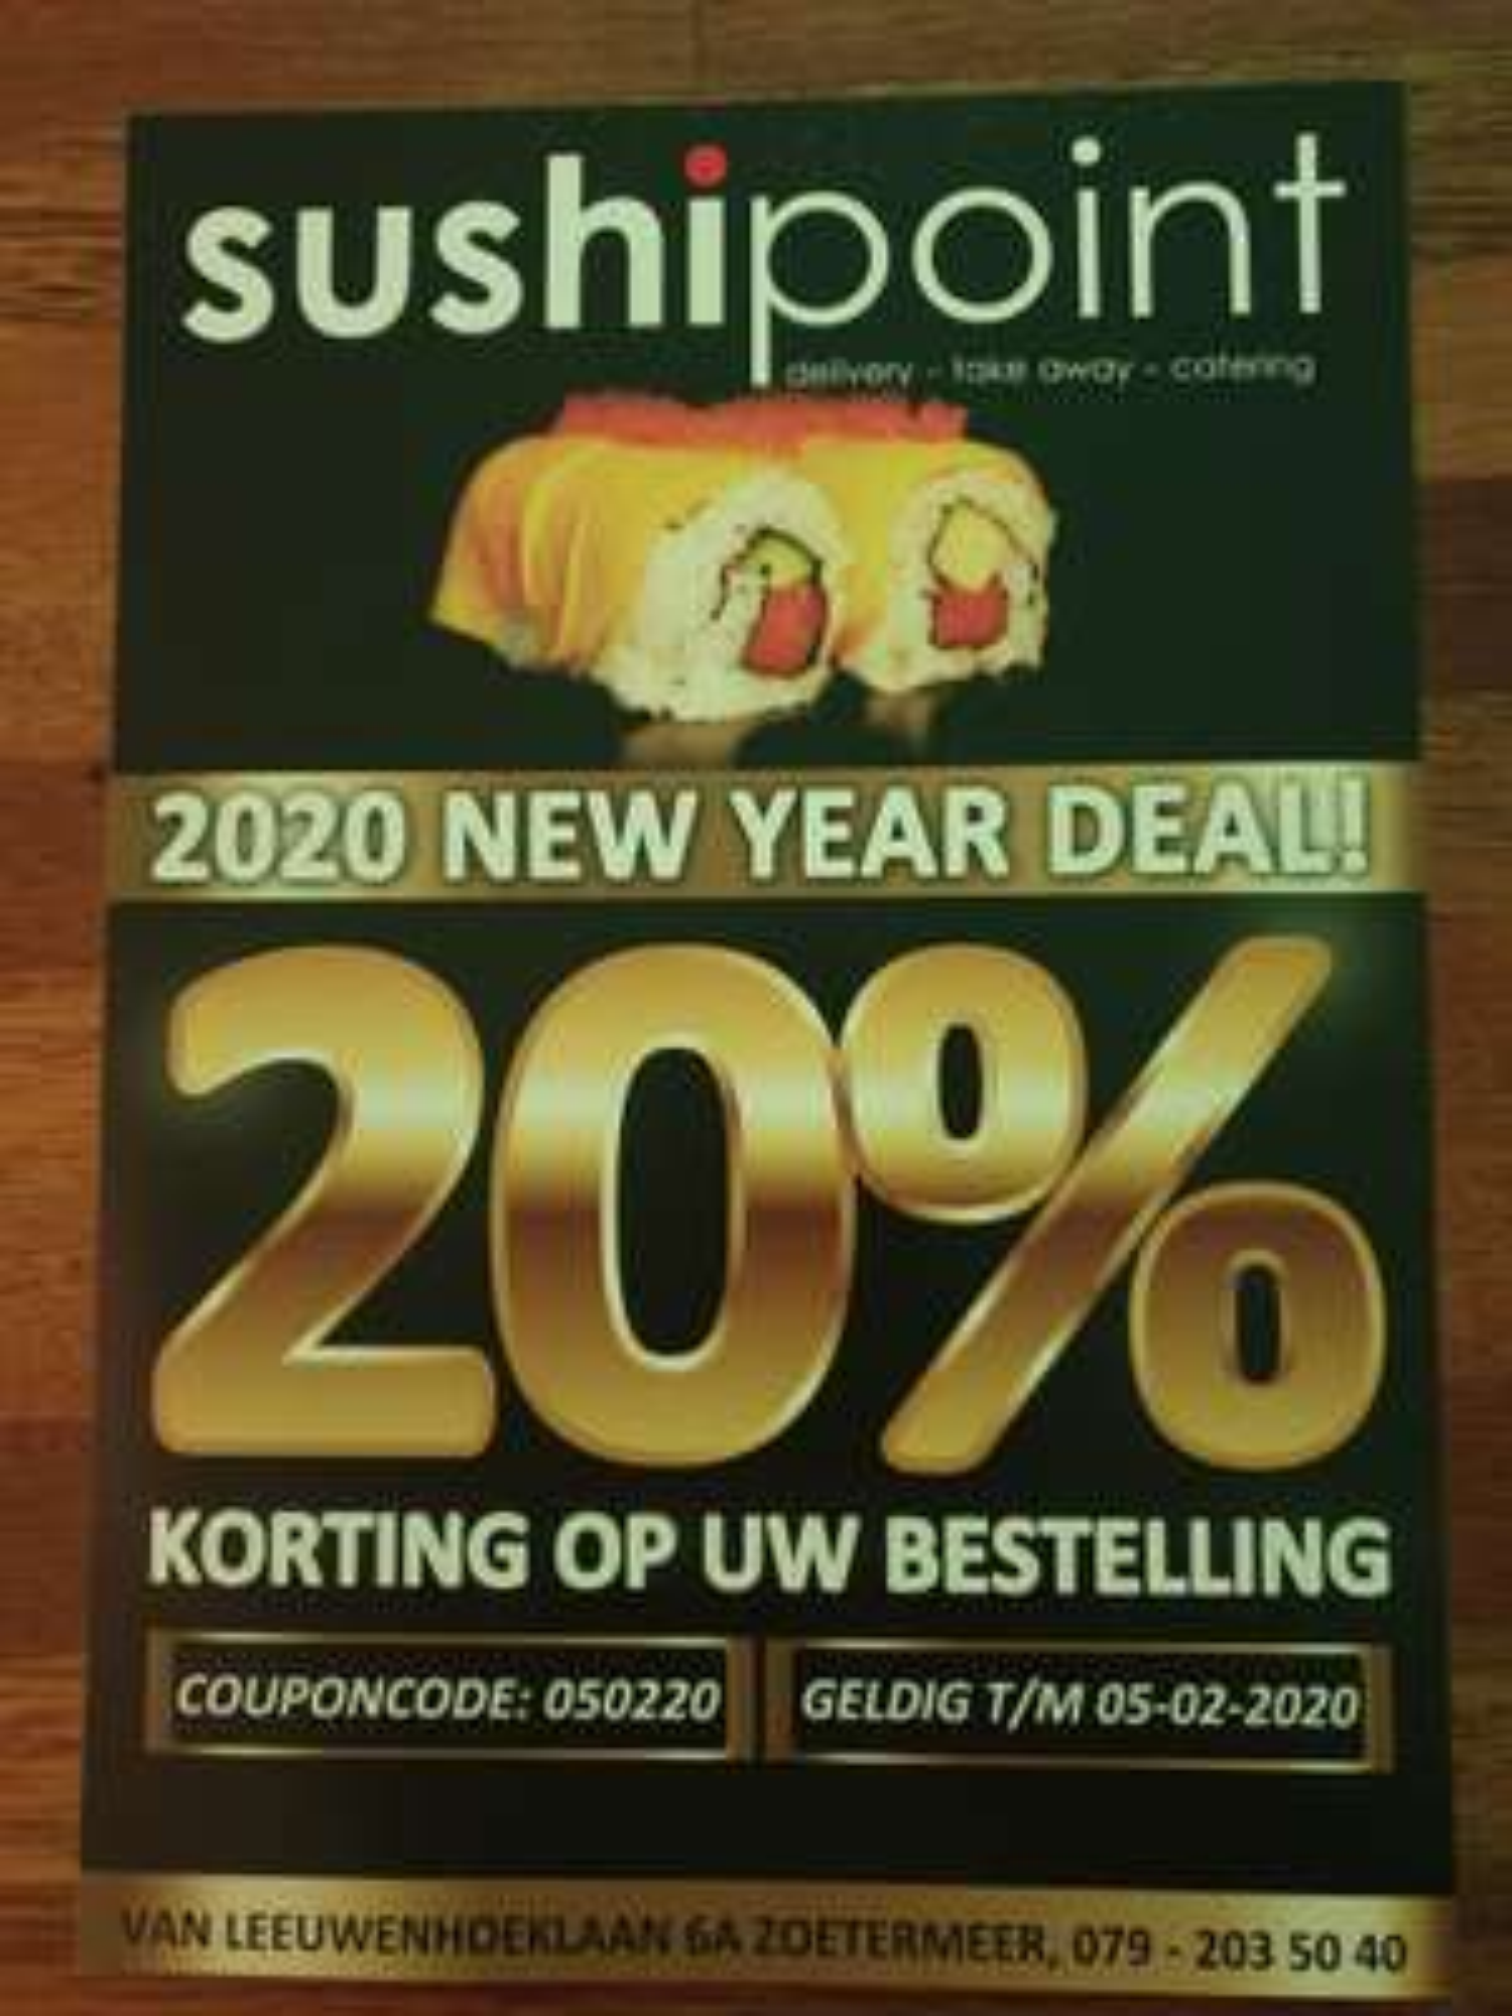 20% korting bij Sushipoint t/m 05-02-2020